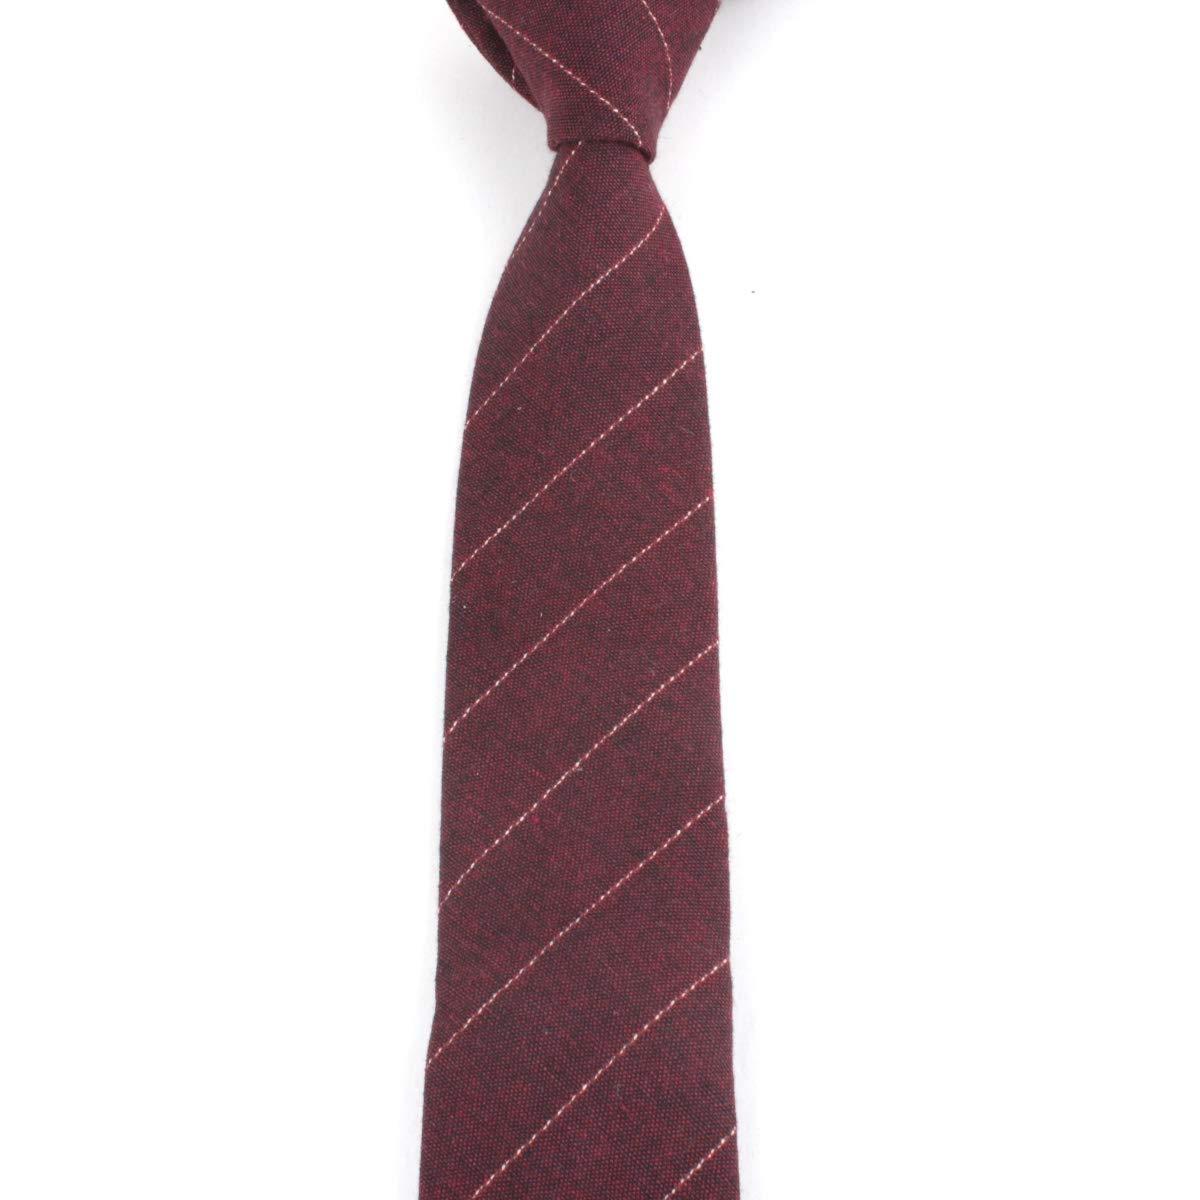 ALOFTT Solid Color Tie 2.36 inch 6 cm Hademade Neckties With Multiple Colors